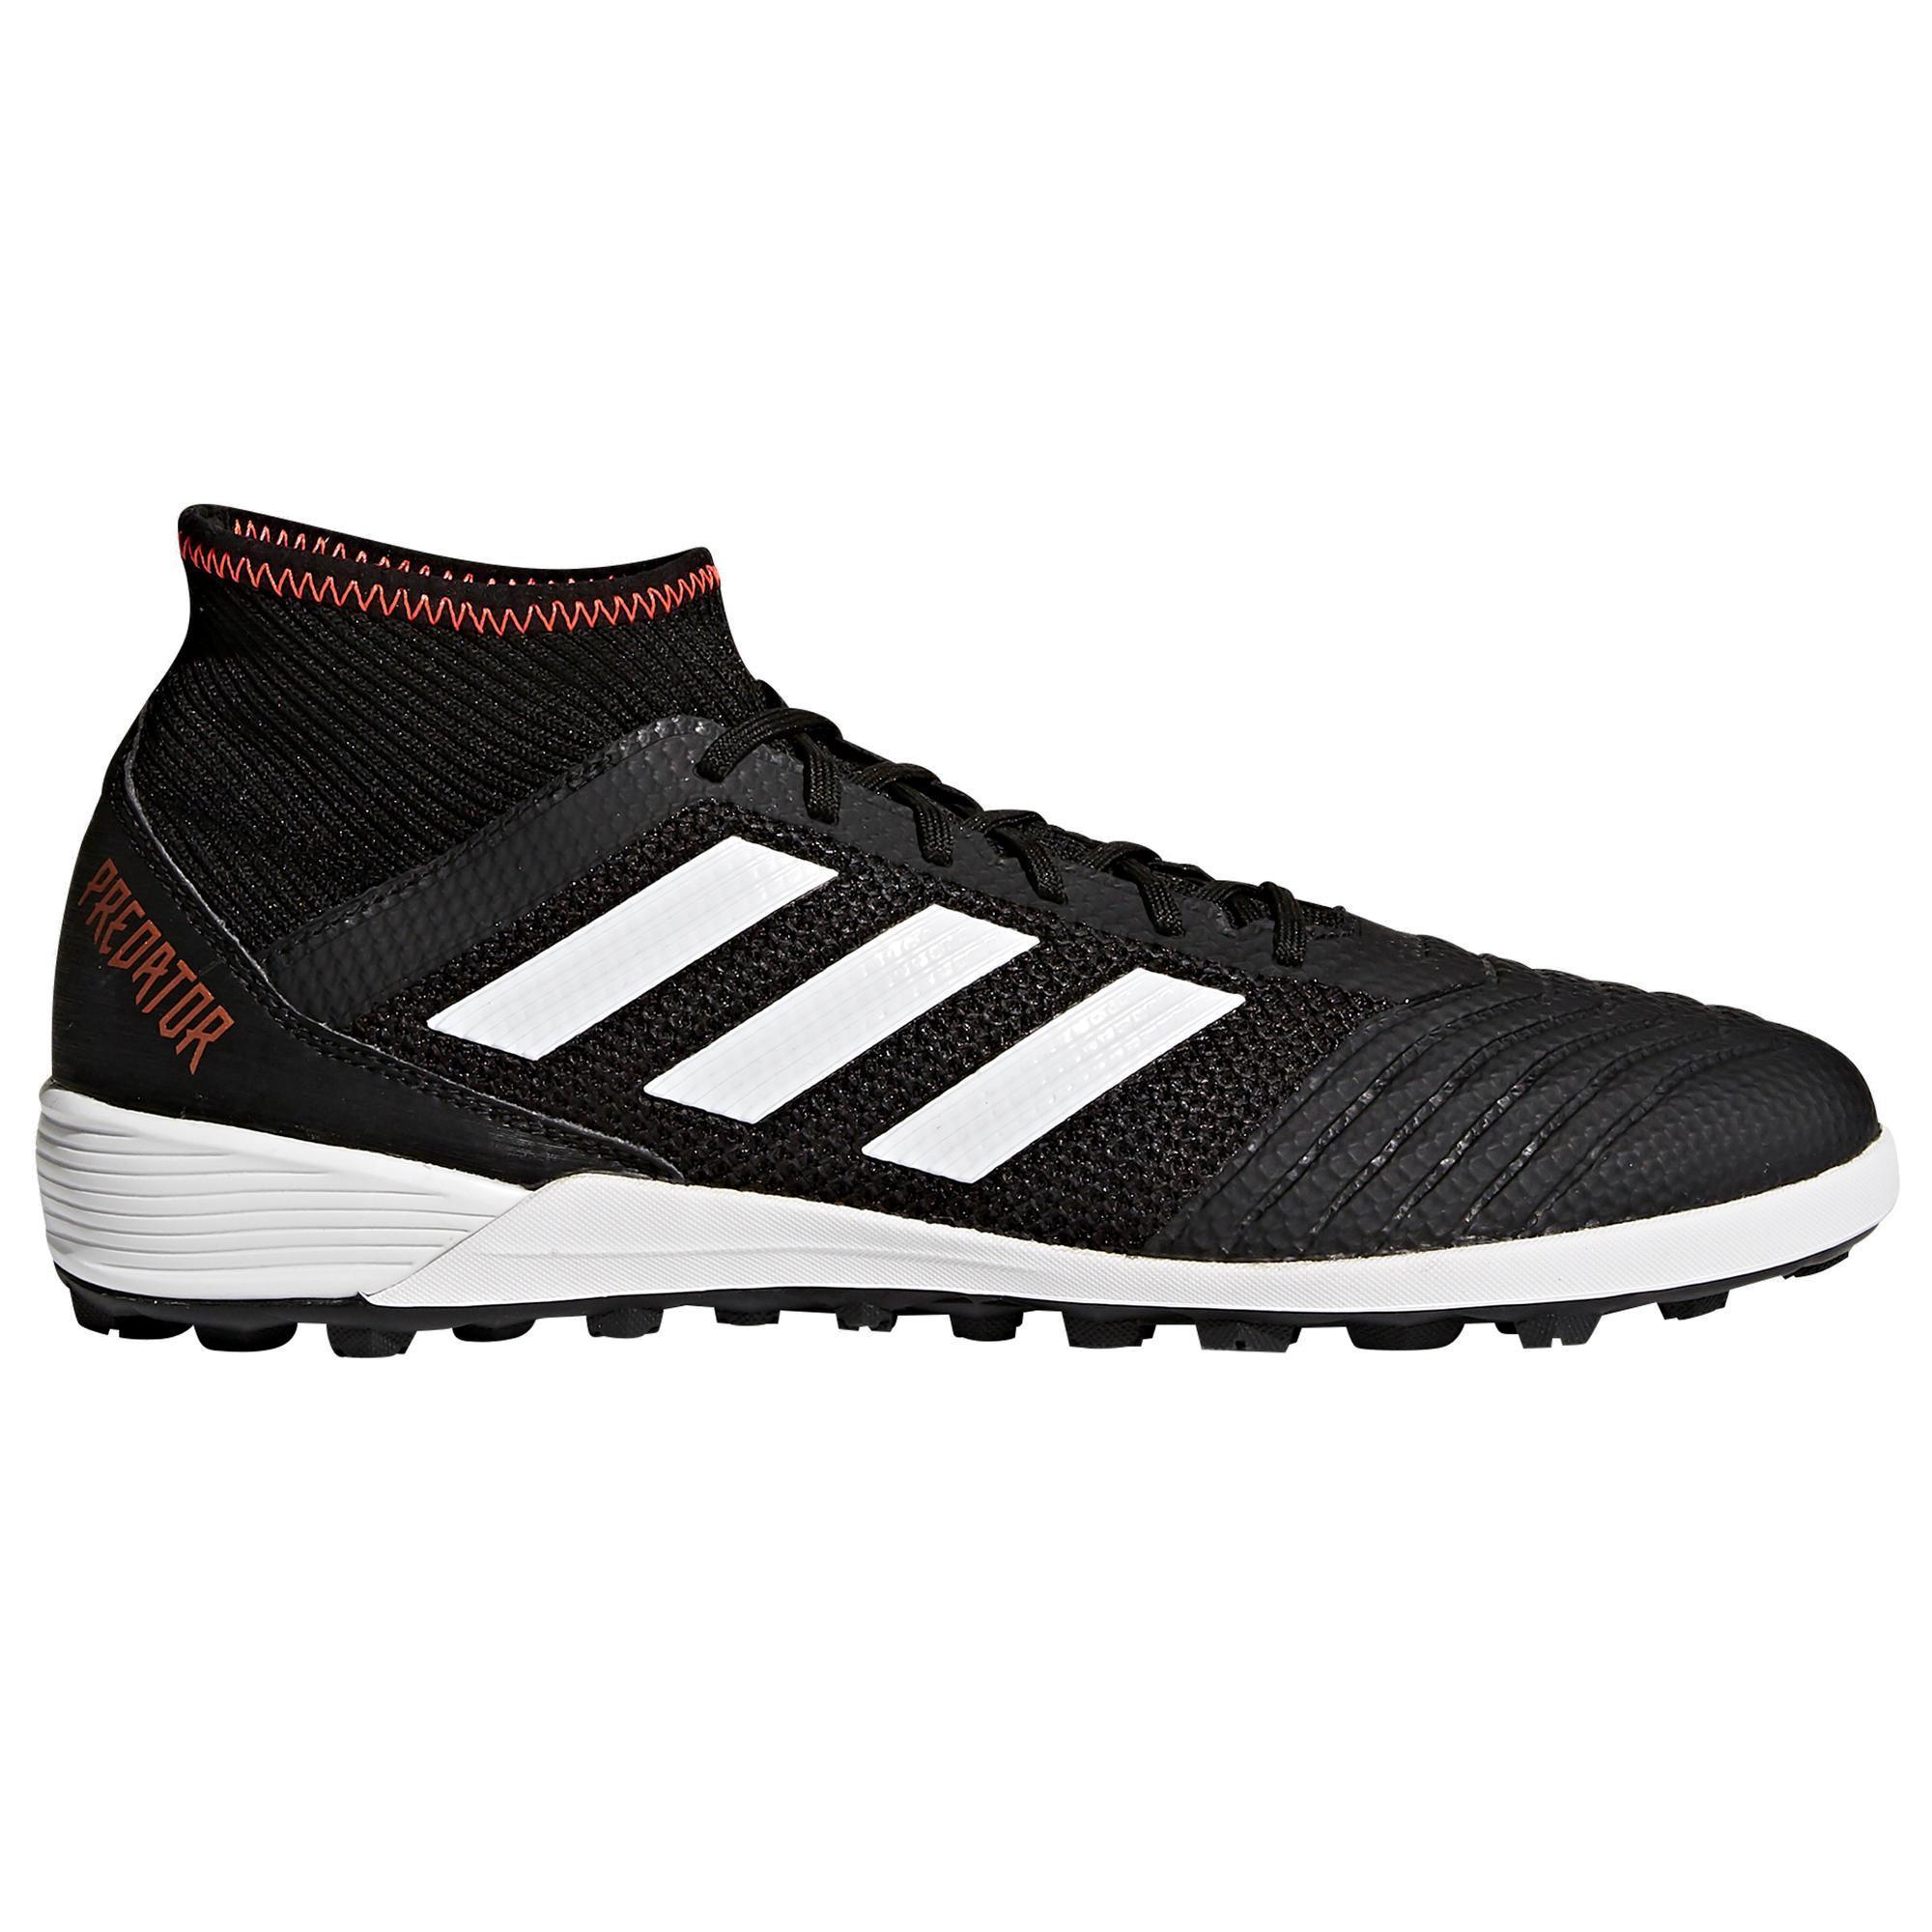 2375114 Adidas Voetbalschoenen kind Predator Tango 18.3 TF zwart